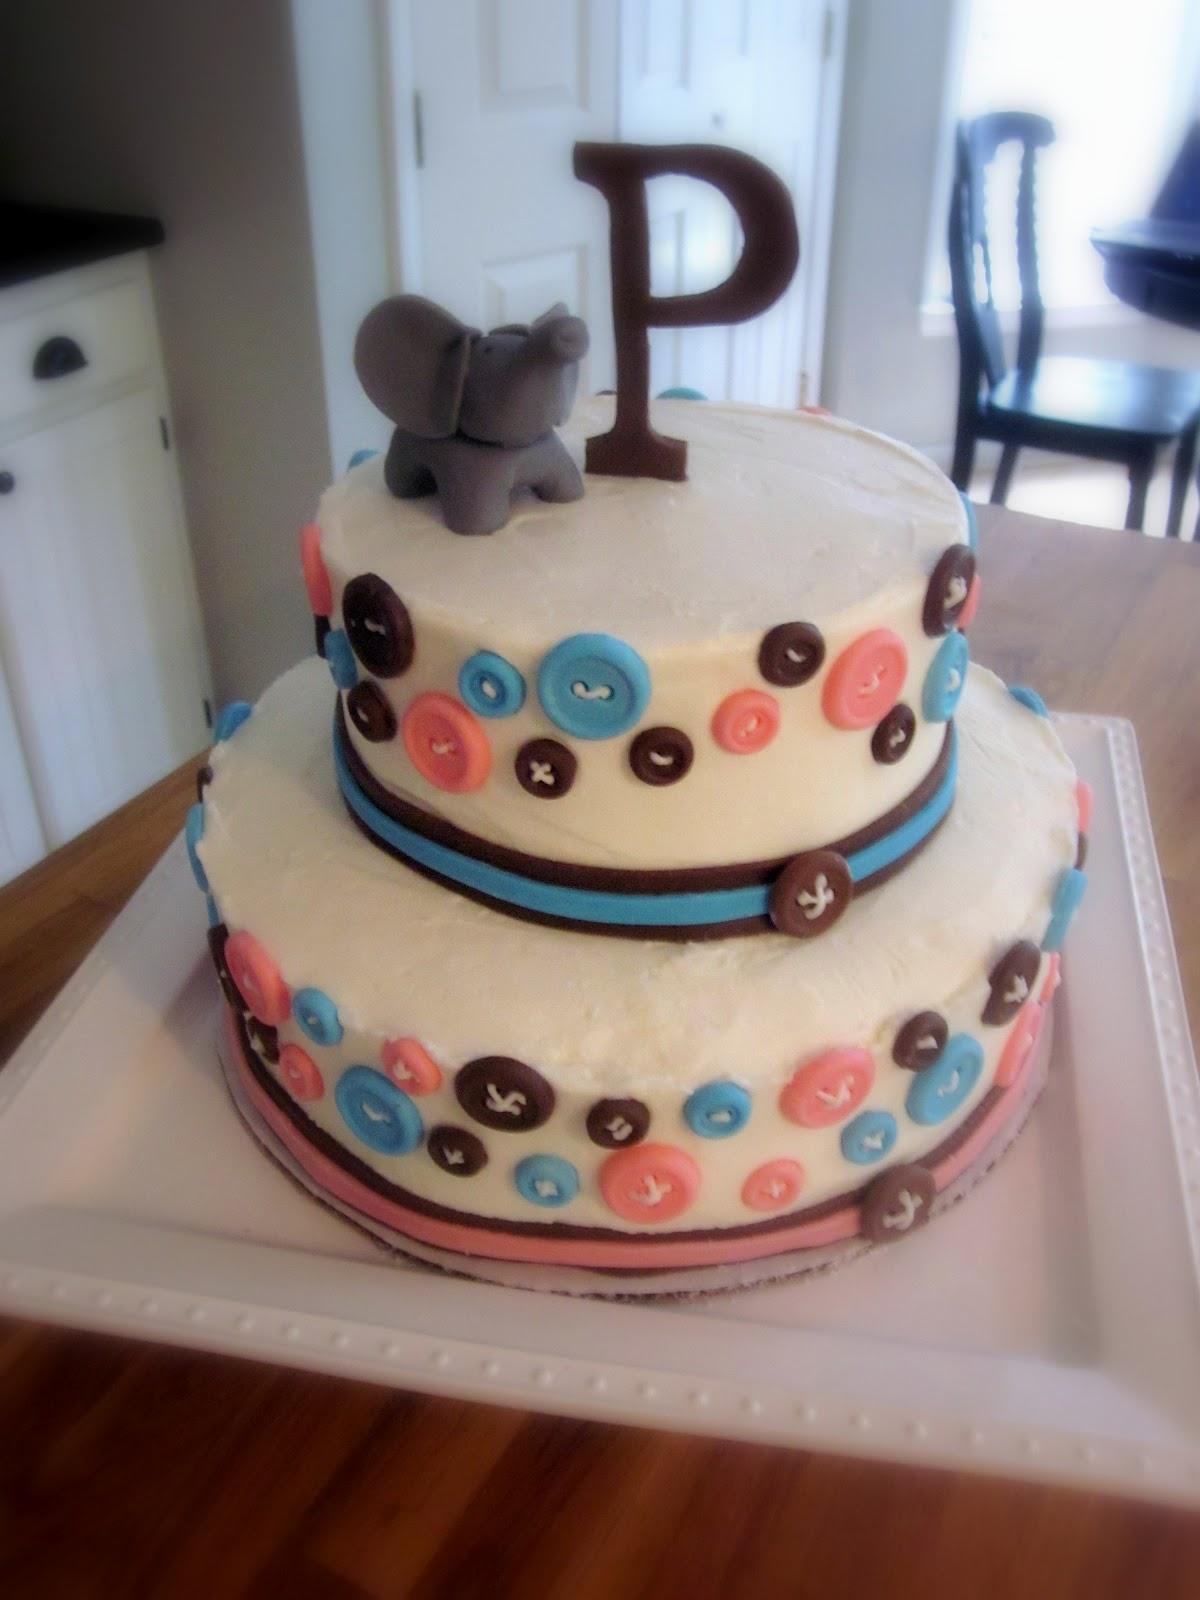 Darlin Designs Gender Reveal Cake